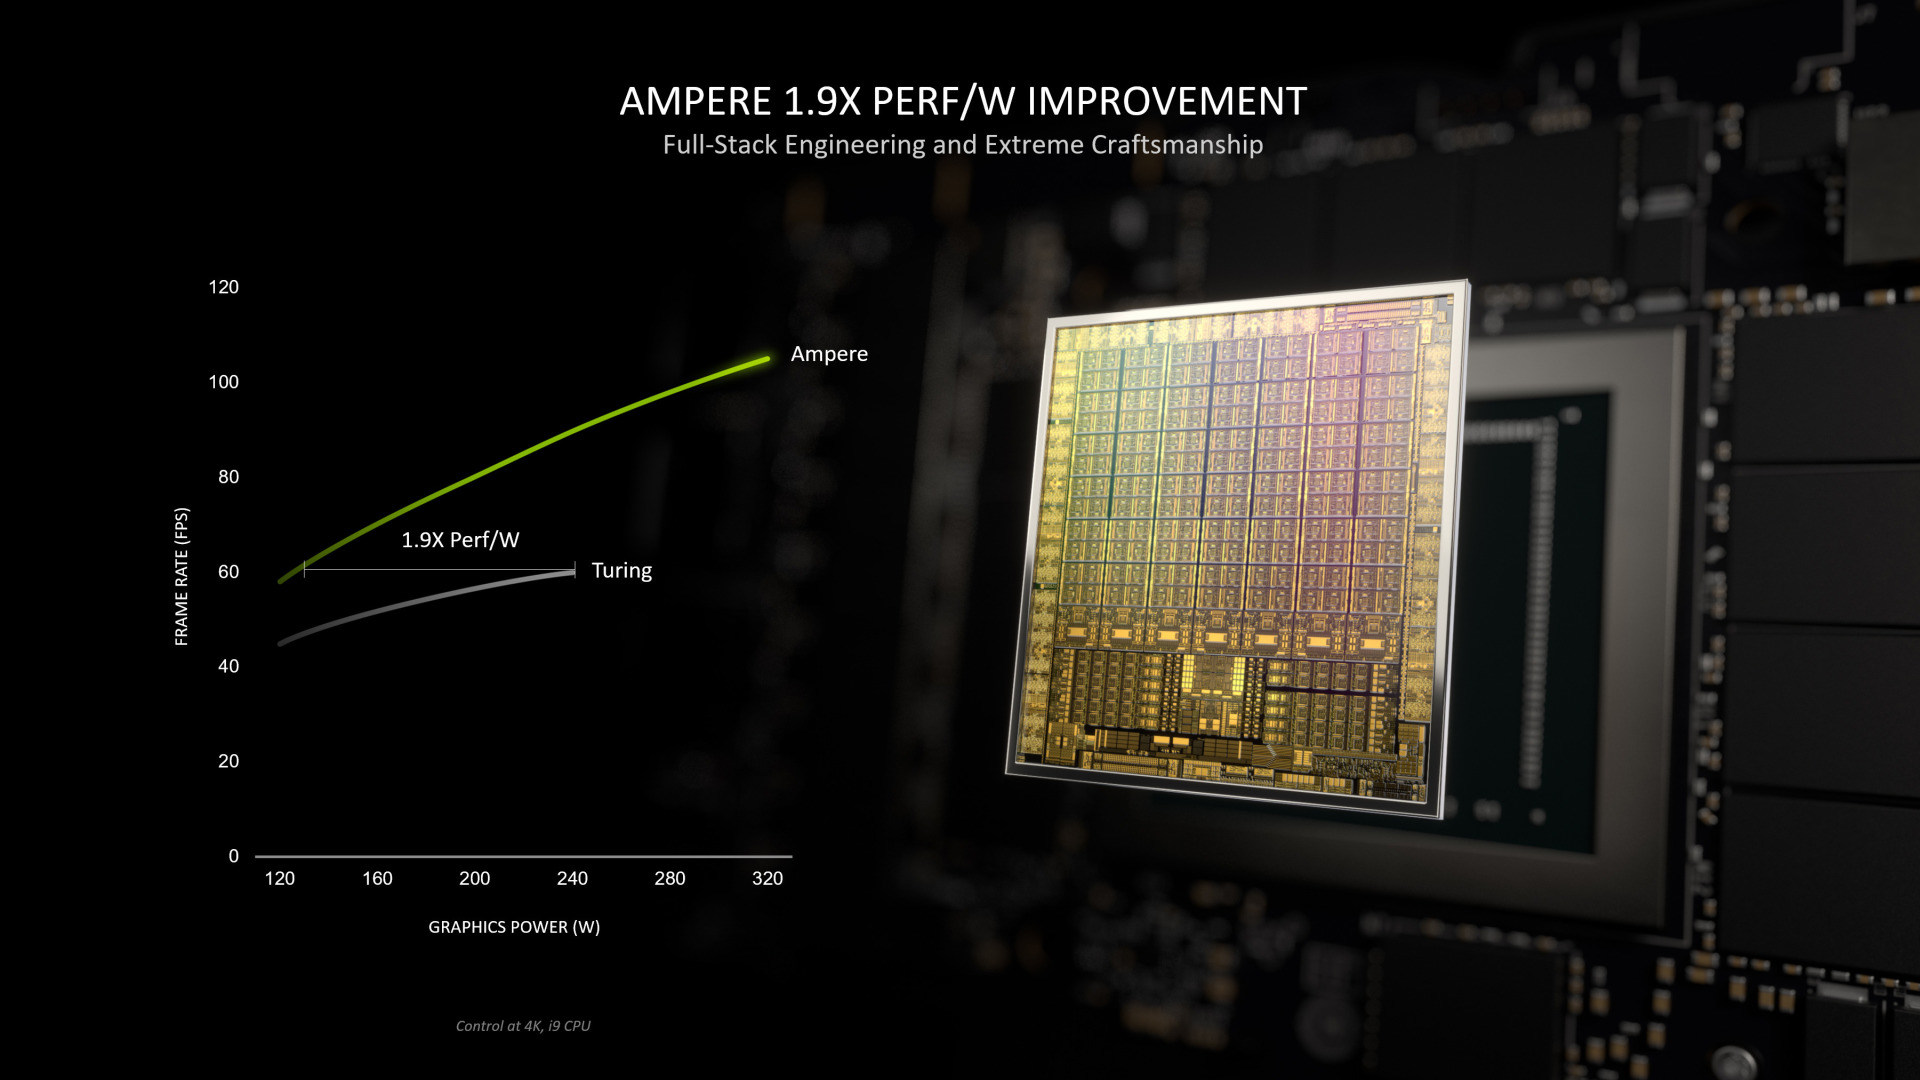 Gaming, Spiele, Games, Nvidia, Gpu, Grafikkarte, Grafik, Geforce, Grafikchip, Performance, Nvidia Geforce, Grafikeinheit, Raytracing, Nvidia Ampere